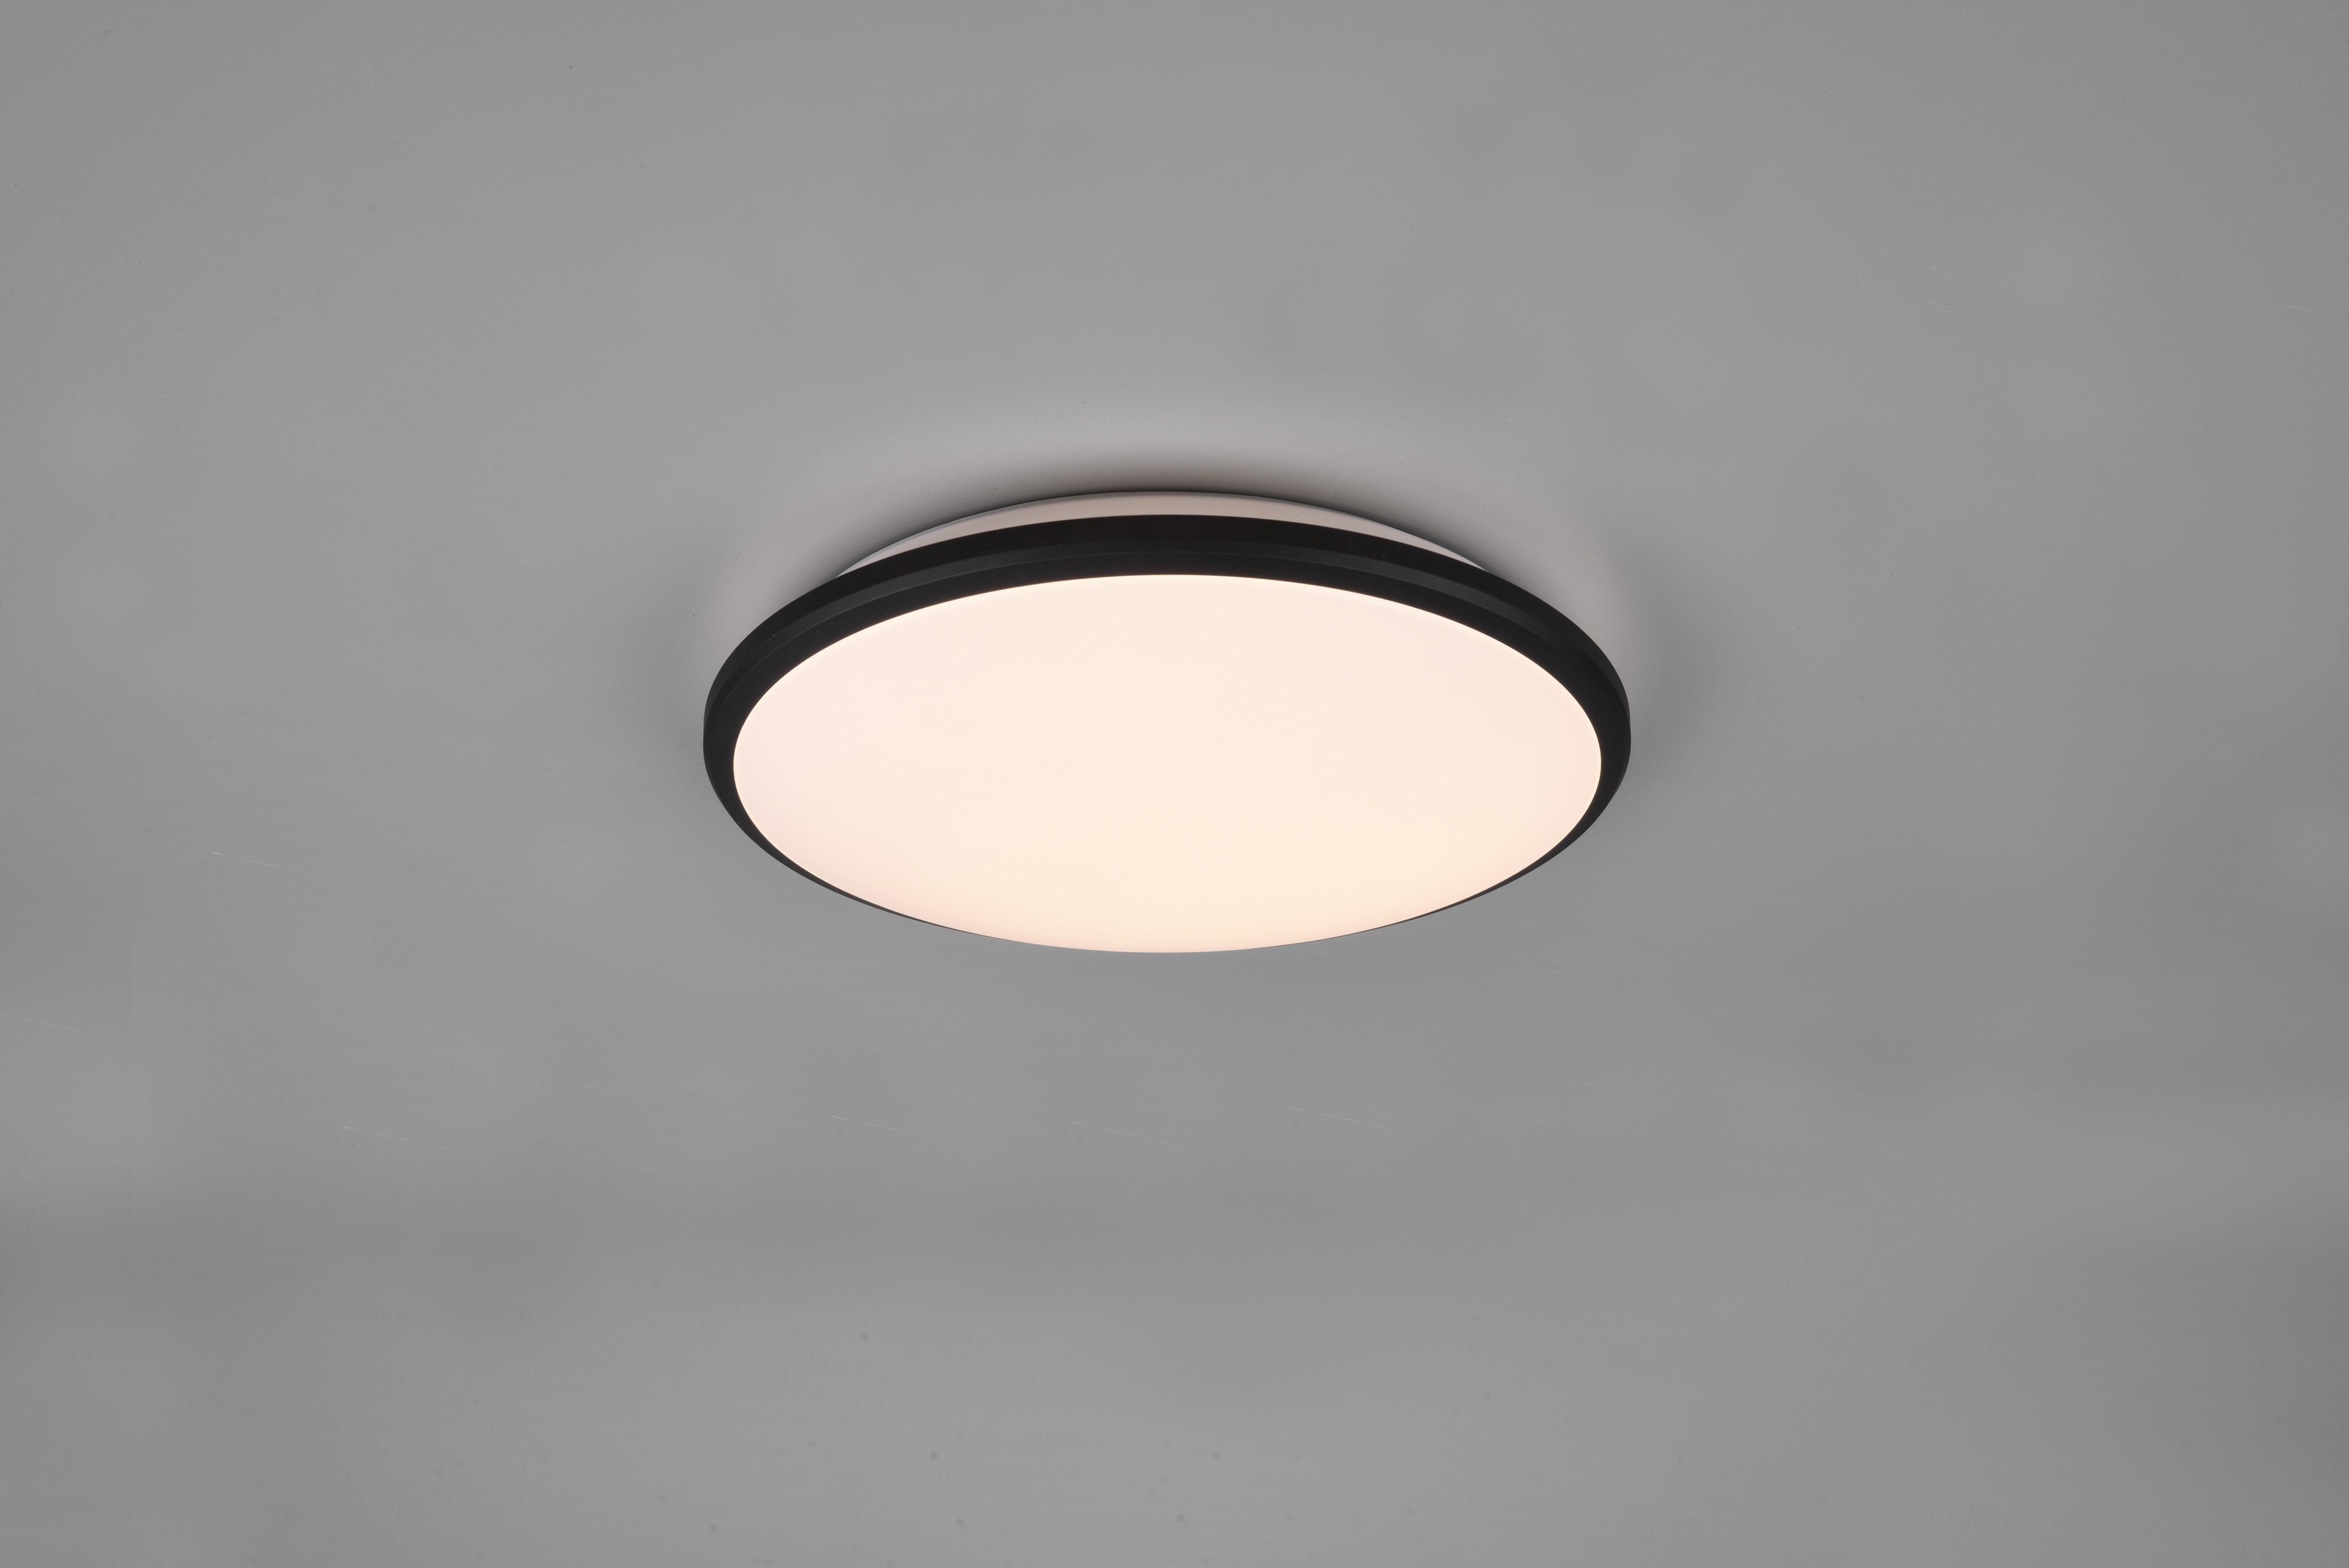 LED Deckenleuchte Limbus